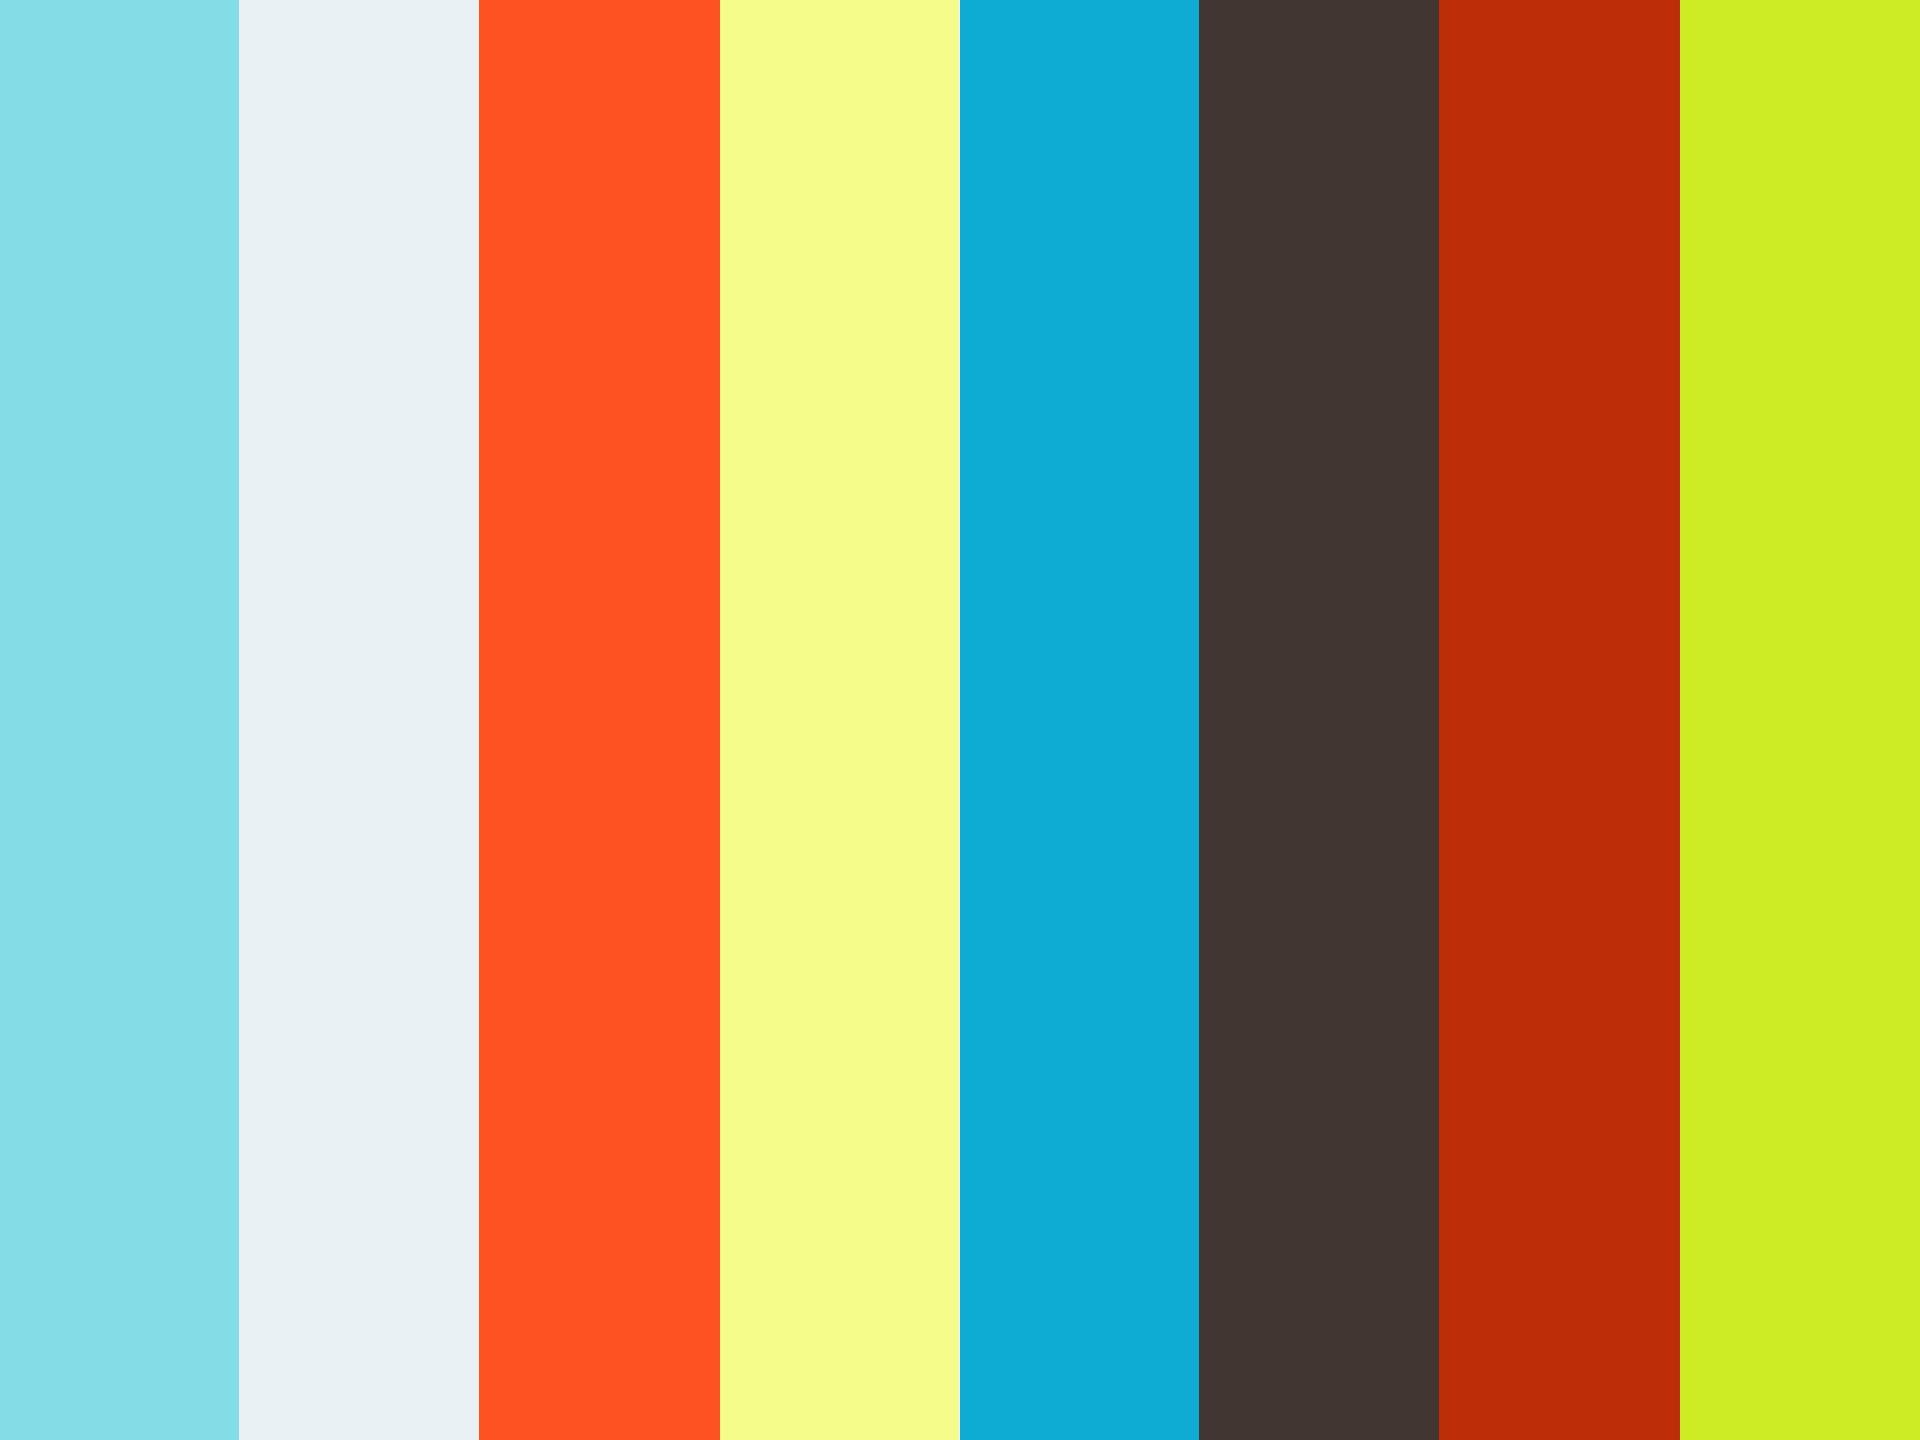 Yebekel Menged - Part 14 (Kana TV Drama Series)